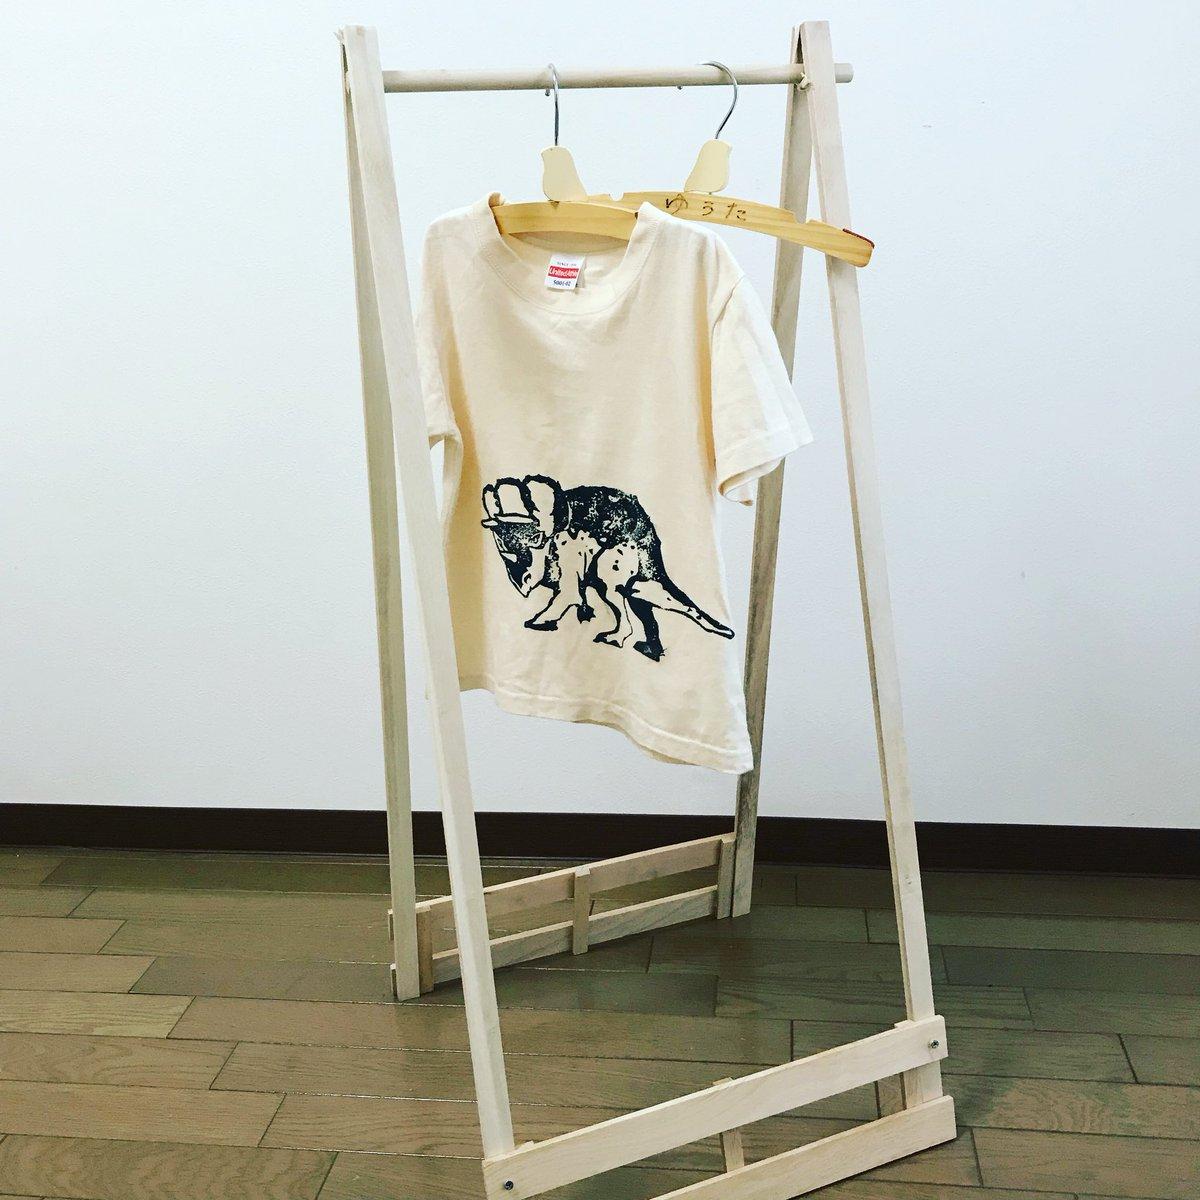 test ツイッターメディア - ハンドメイドメイカーズに向けて、卓上ハンガーラックを製作。 Tシャツと特大2WAYバッグと布巾とポチ袋とトートバッグとコースターと、あとはもちろん消しゴムはんこを持っていきます。そしてブース内でワークショップもやって…という予定。 楽しみ!!! #handmademakers https://t.co/EyKLVMlCBf